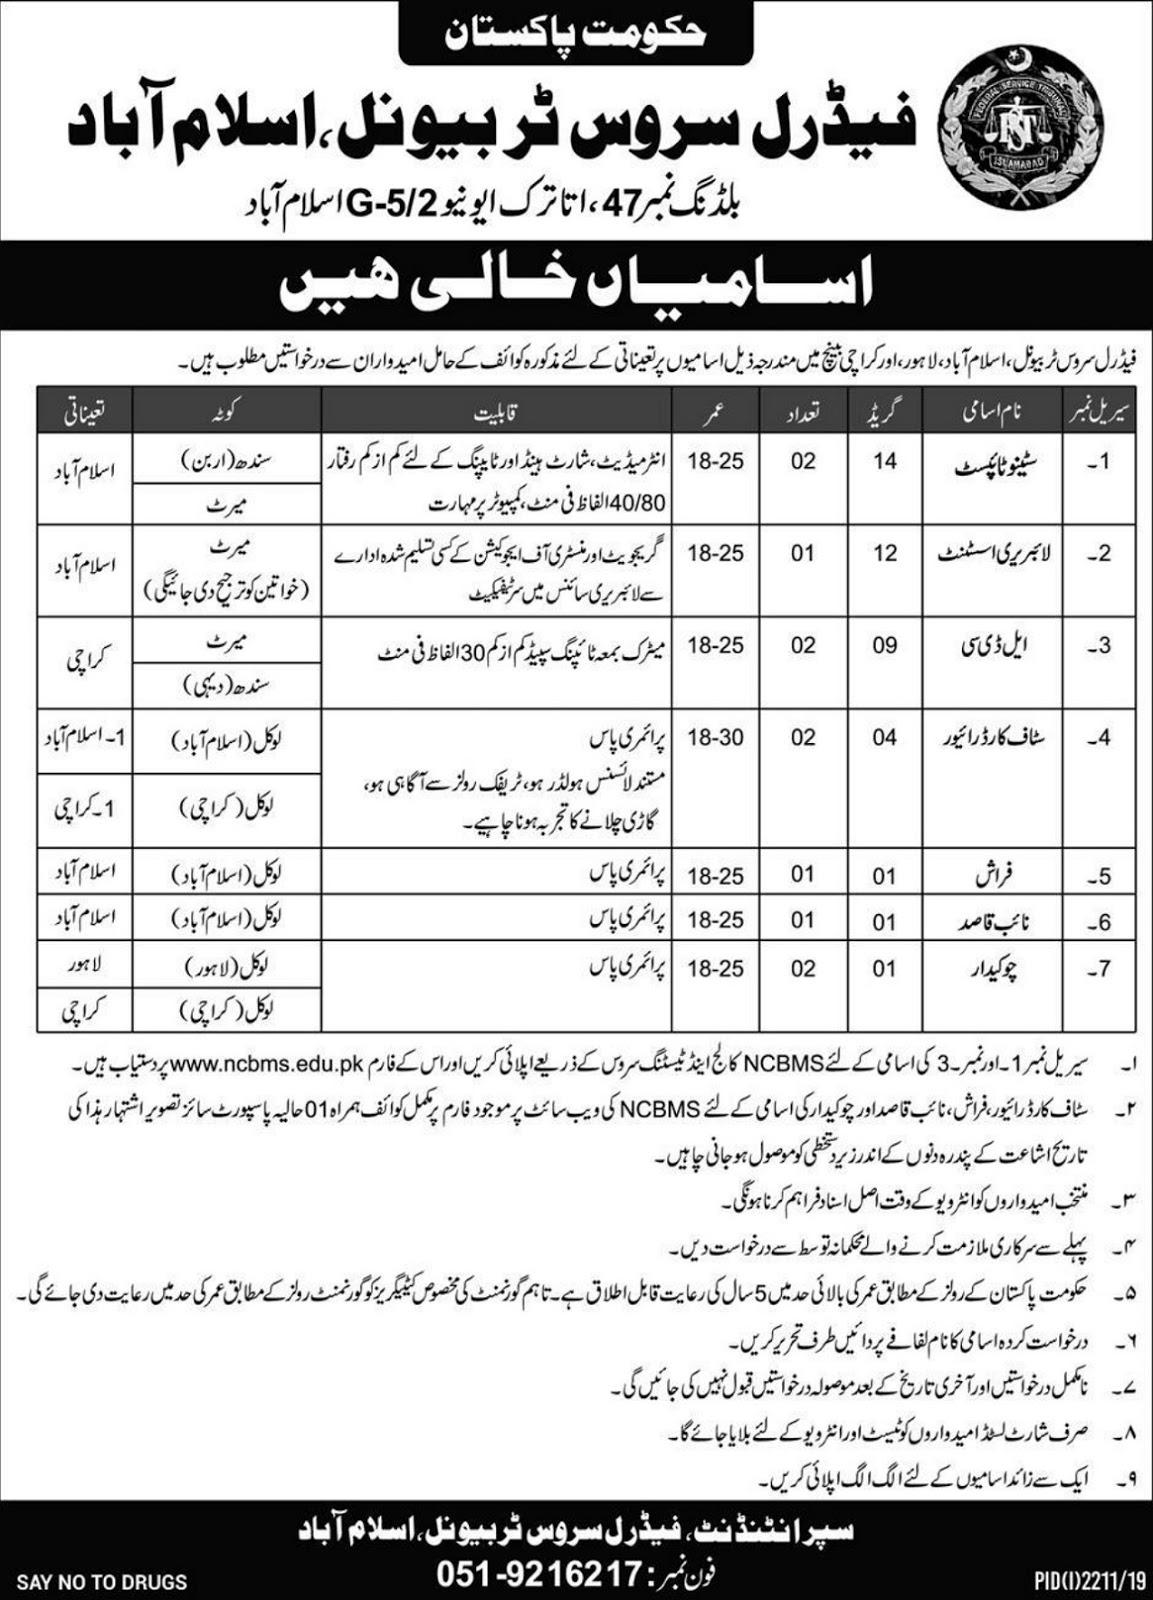 Federal Service Tribunal Islamabad Jobs 2019 Latest